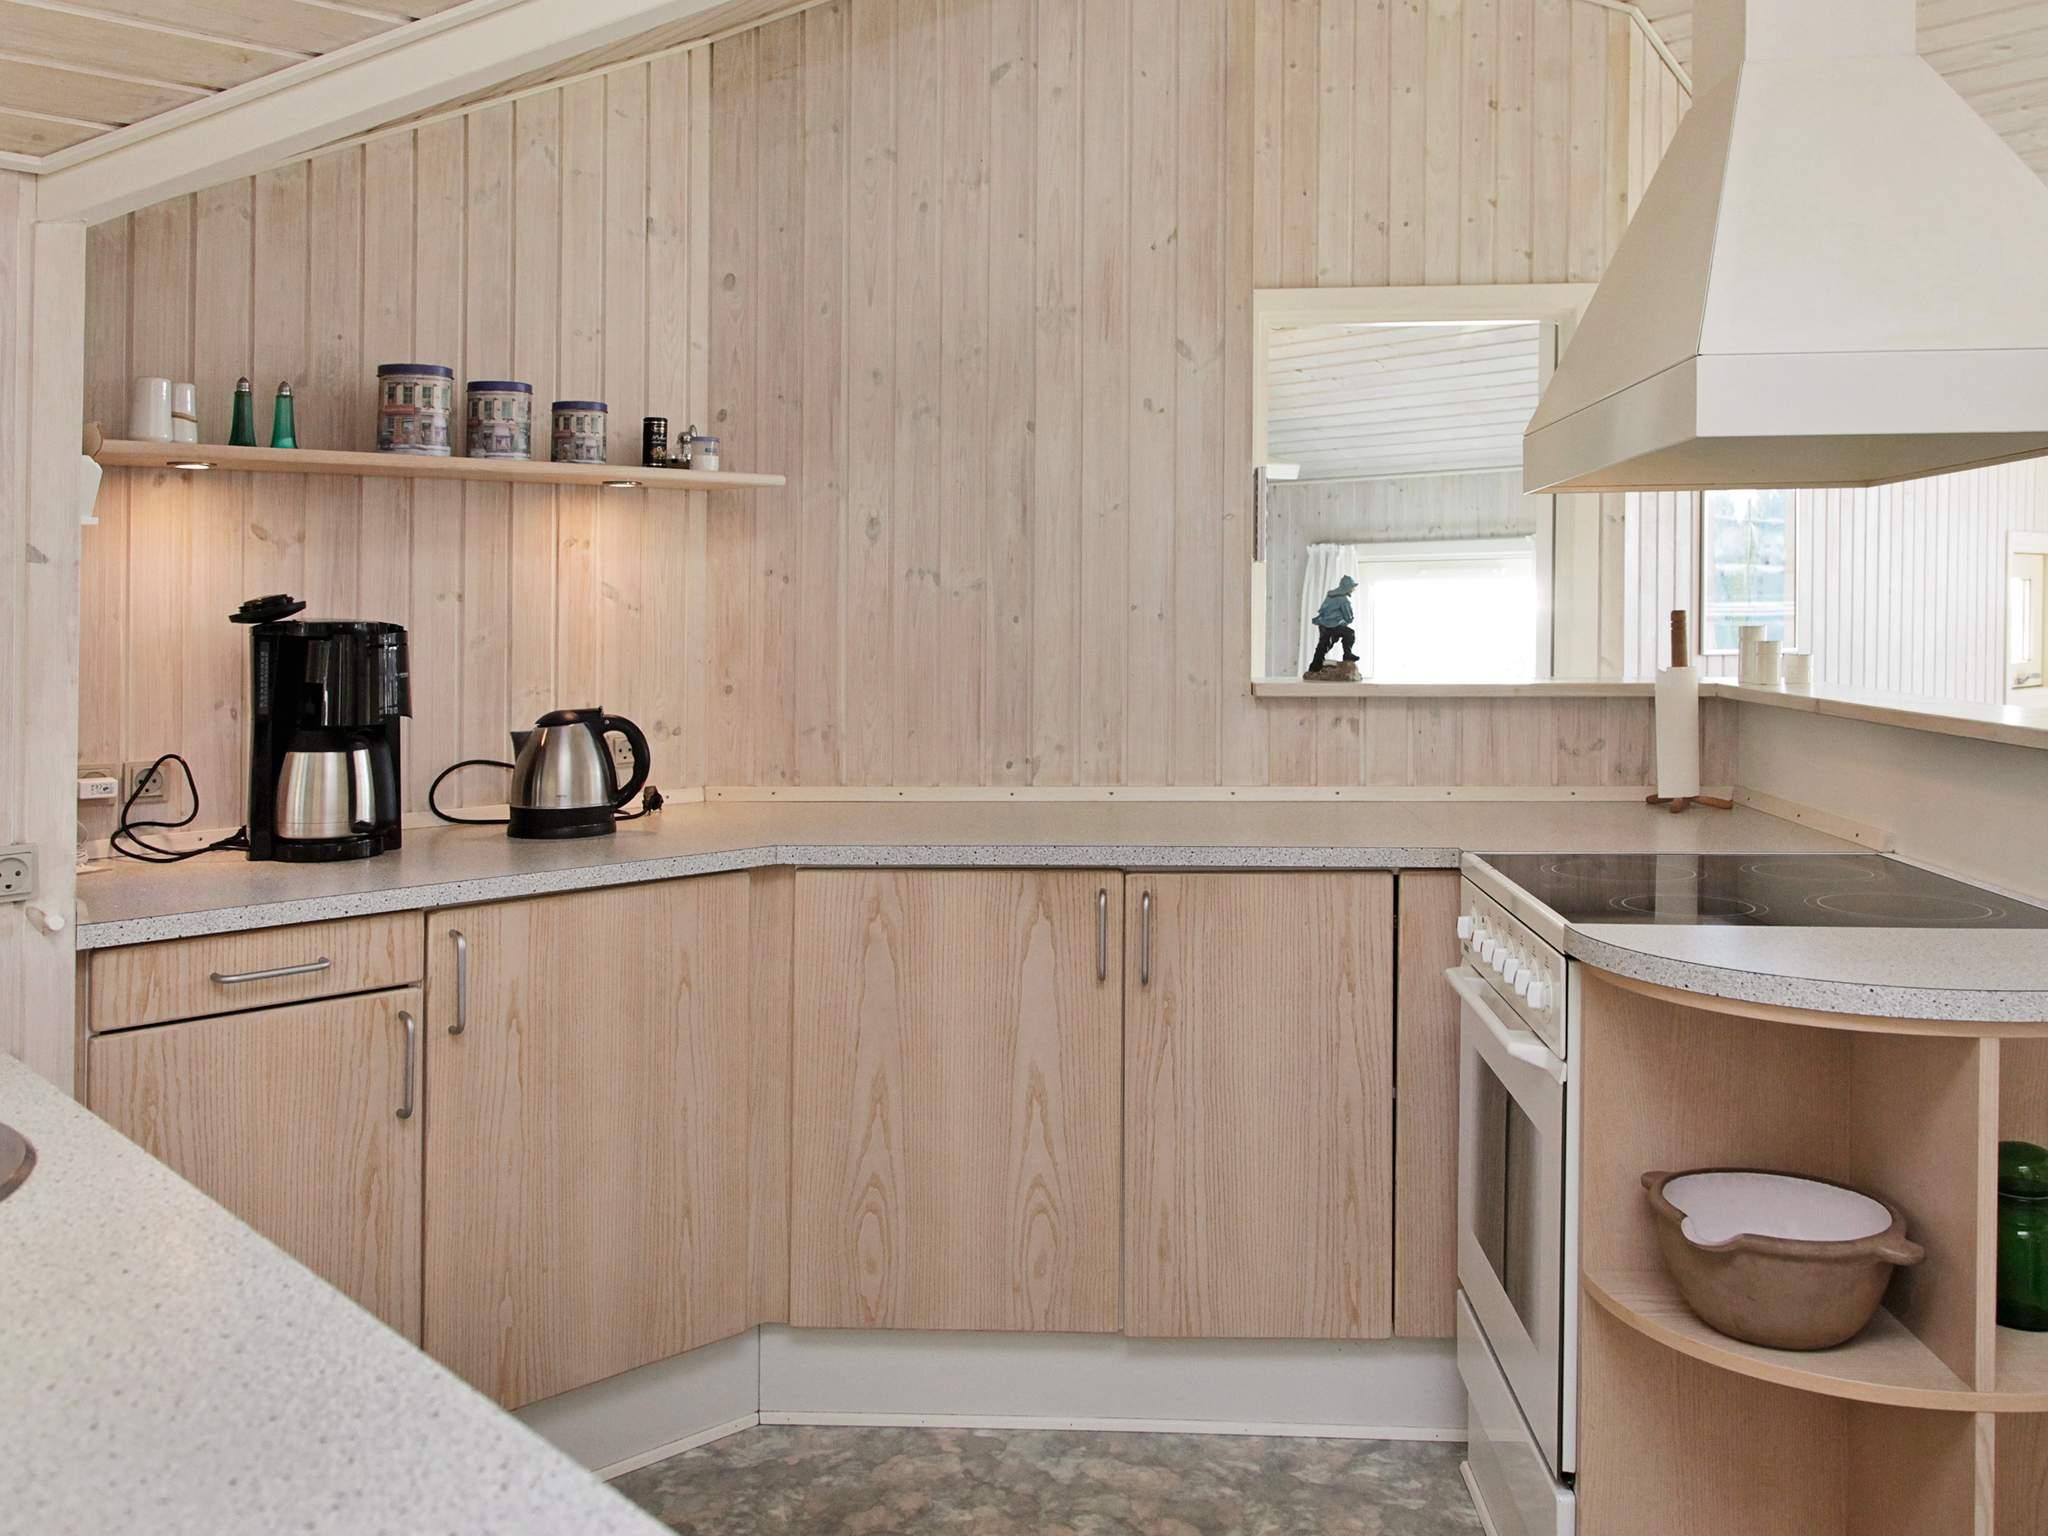 Ferienhaus Vesteregn (82671), Humble, , Langeland, Dänemark, Bild 4